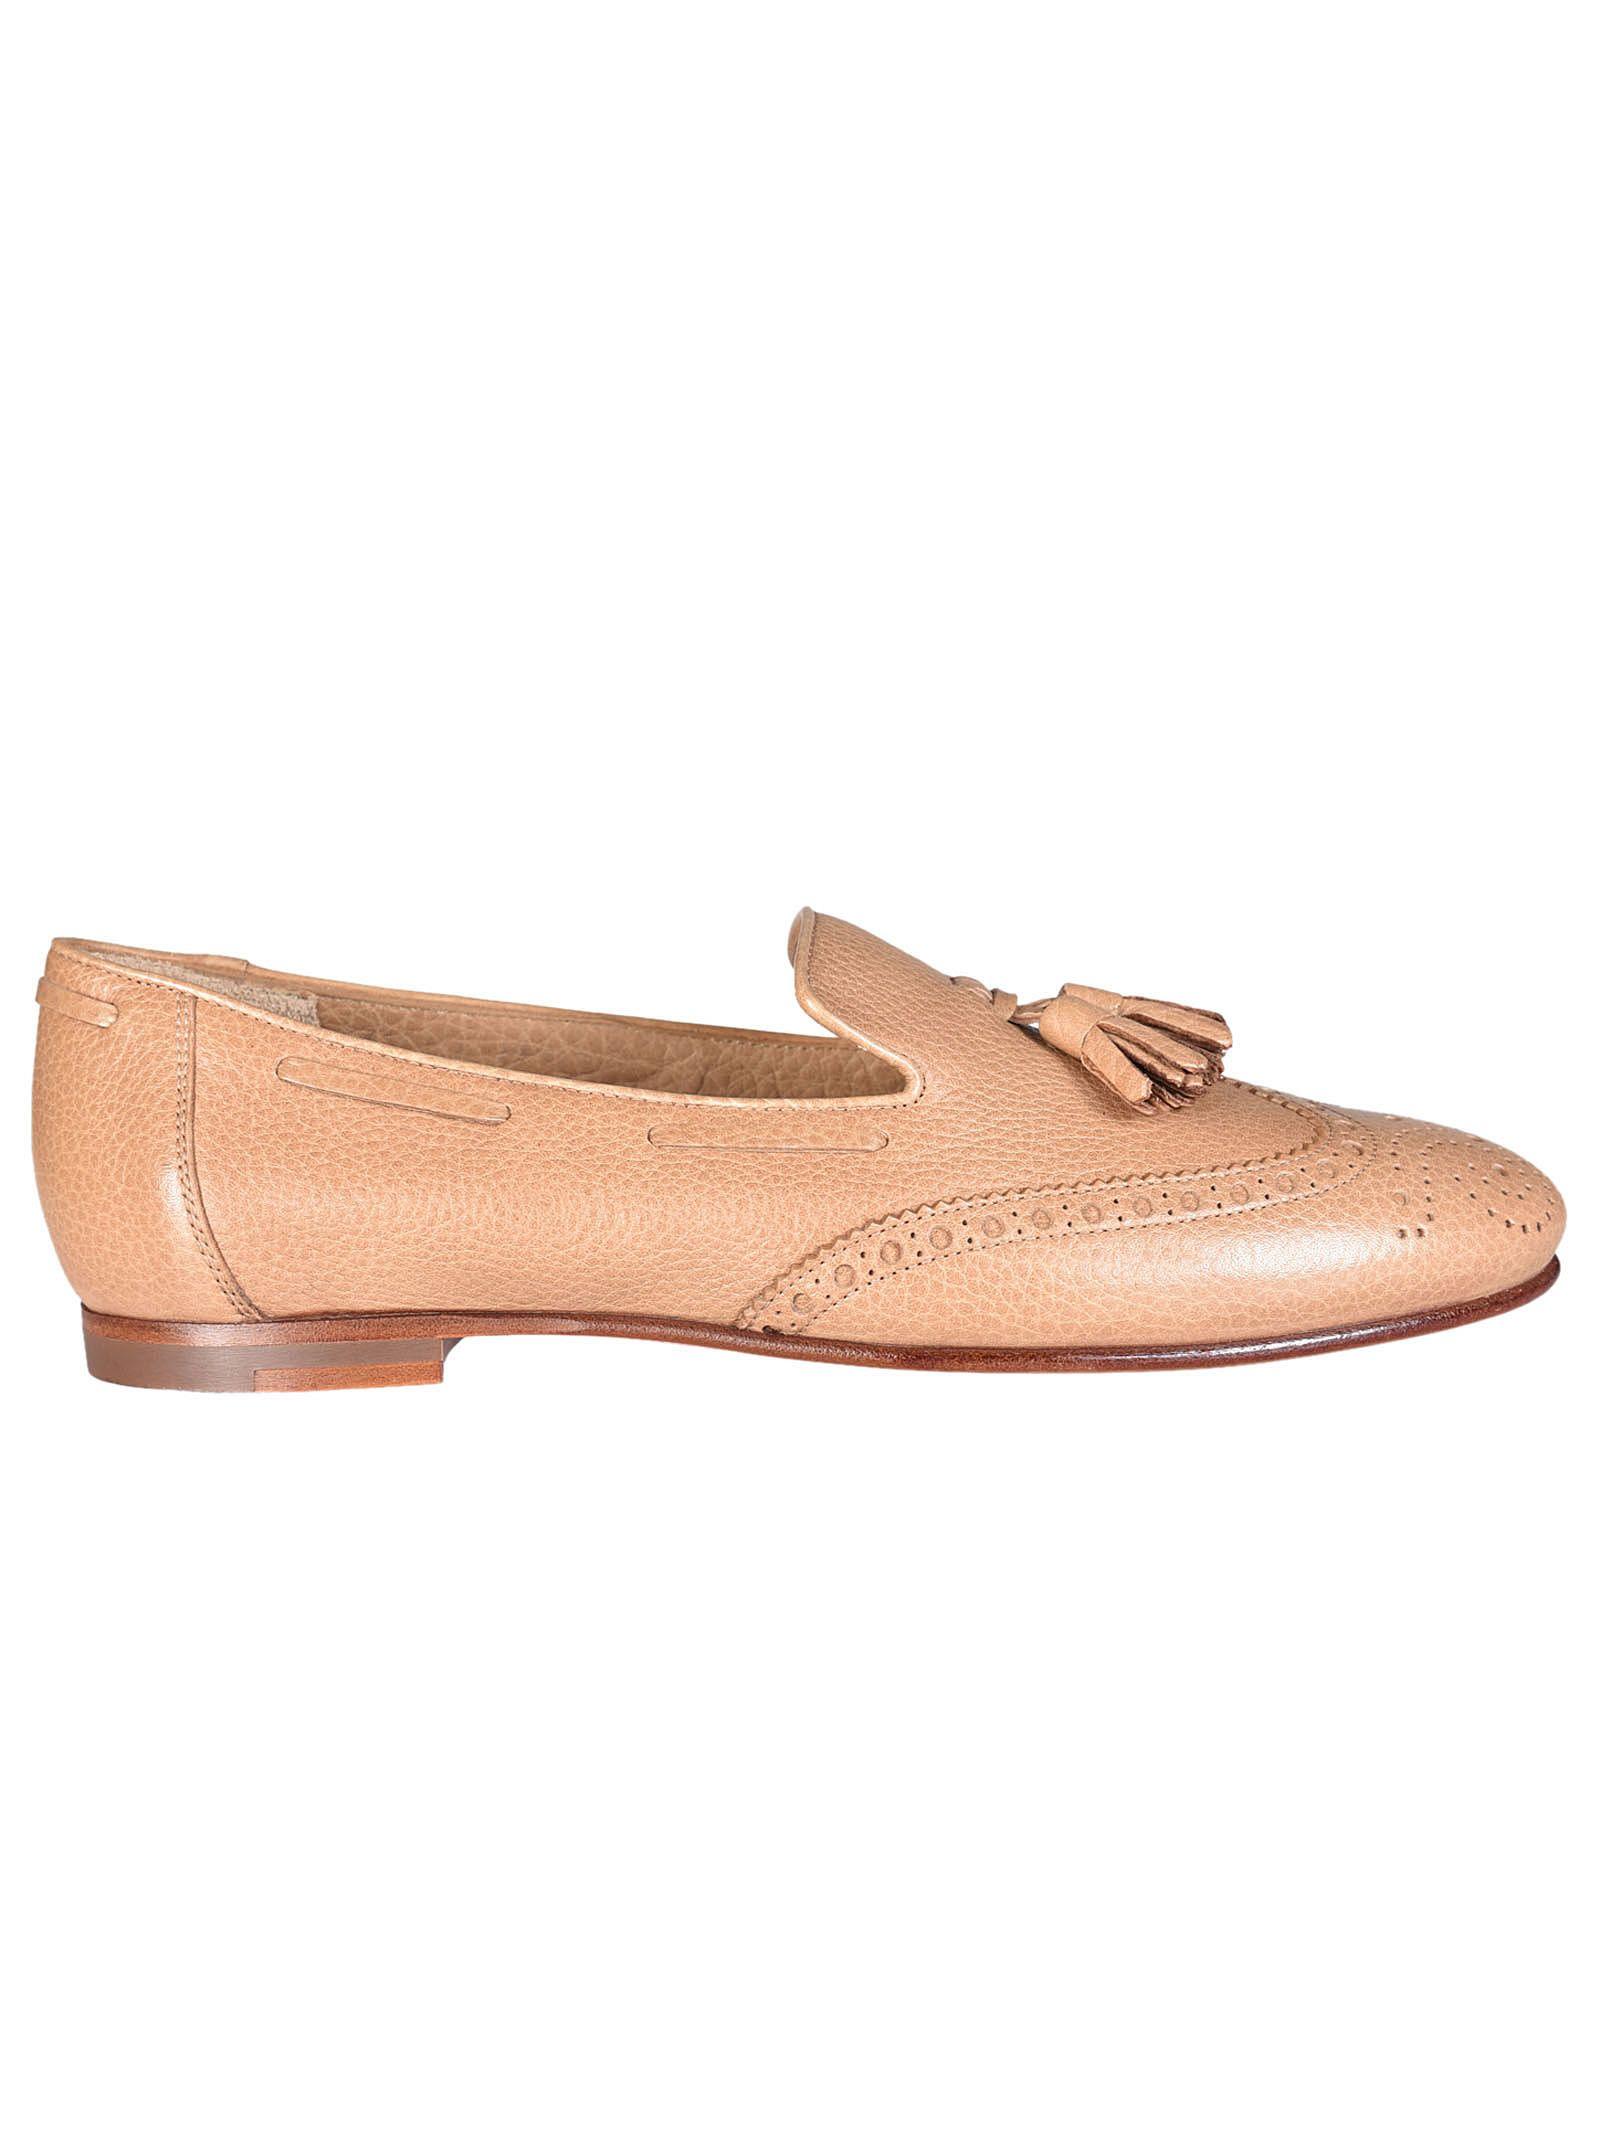 Santoni Classic Tassel Loafer